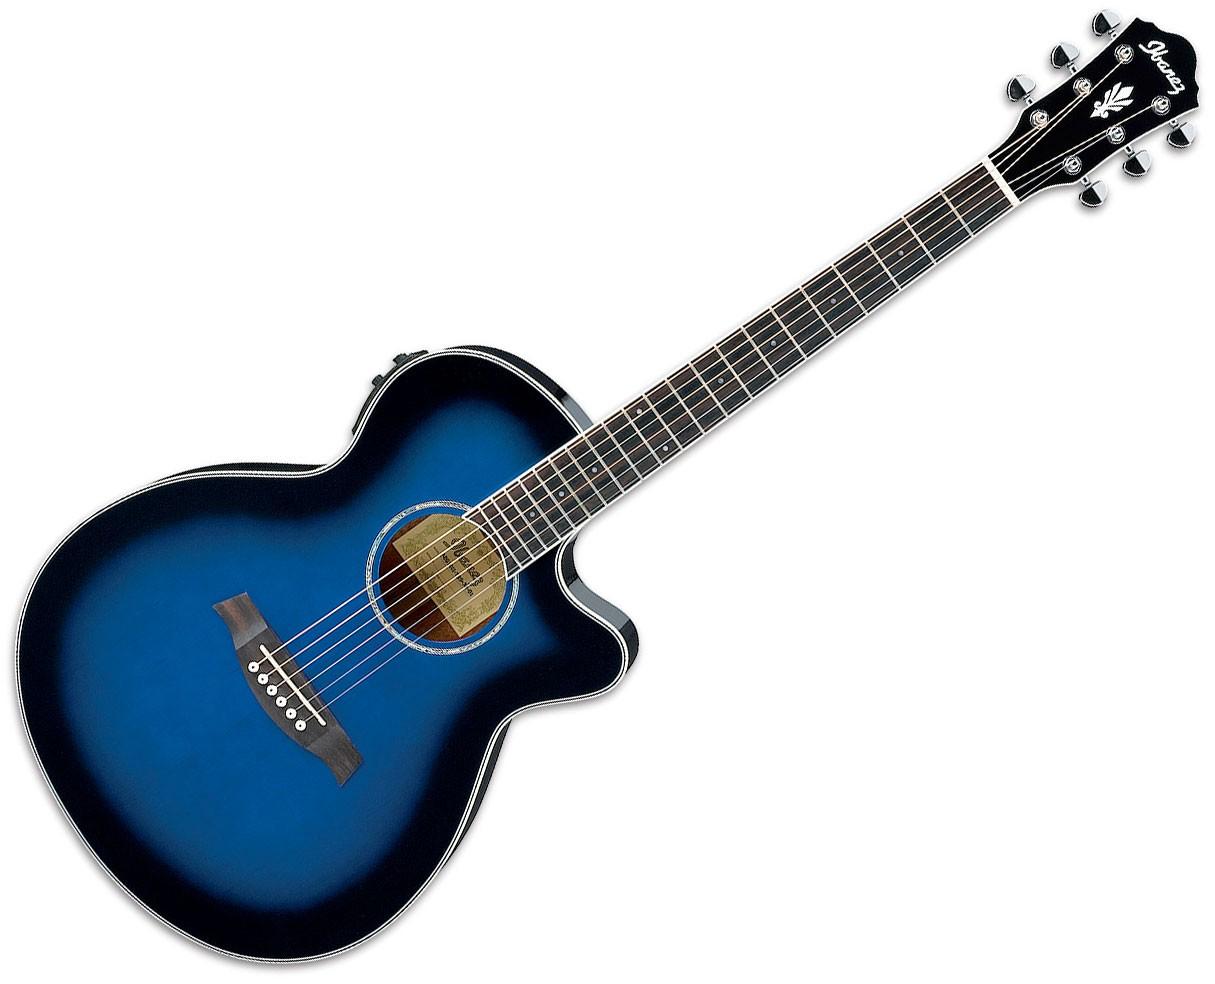 Ibanez AEG10II 6-String Acoustic-Electric Guitar - Transparent Blue Sunburst Gloss